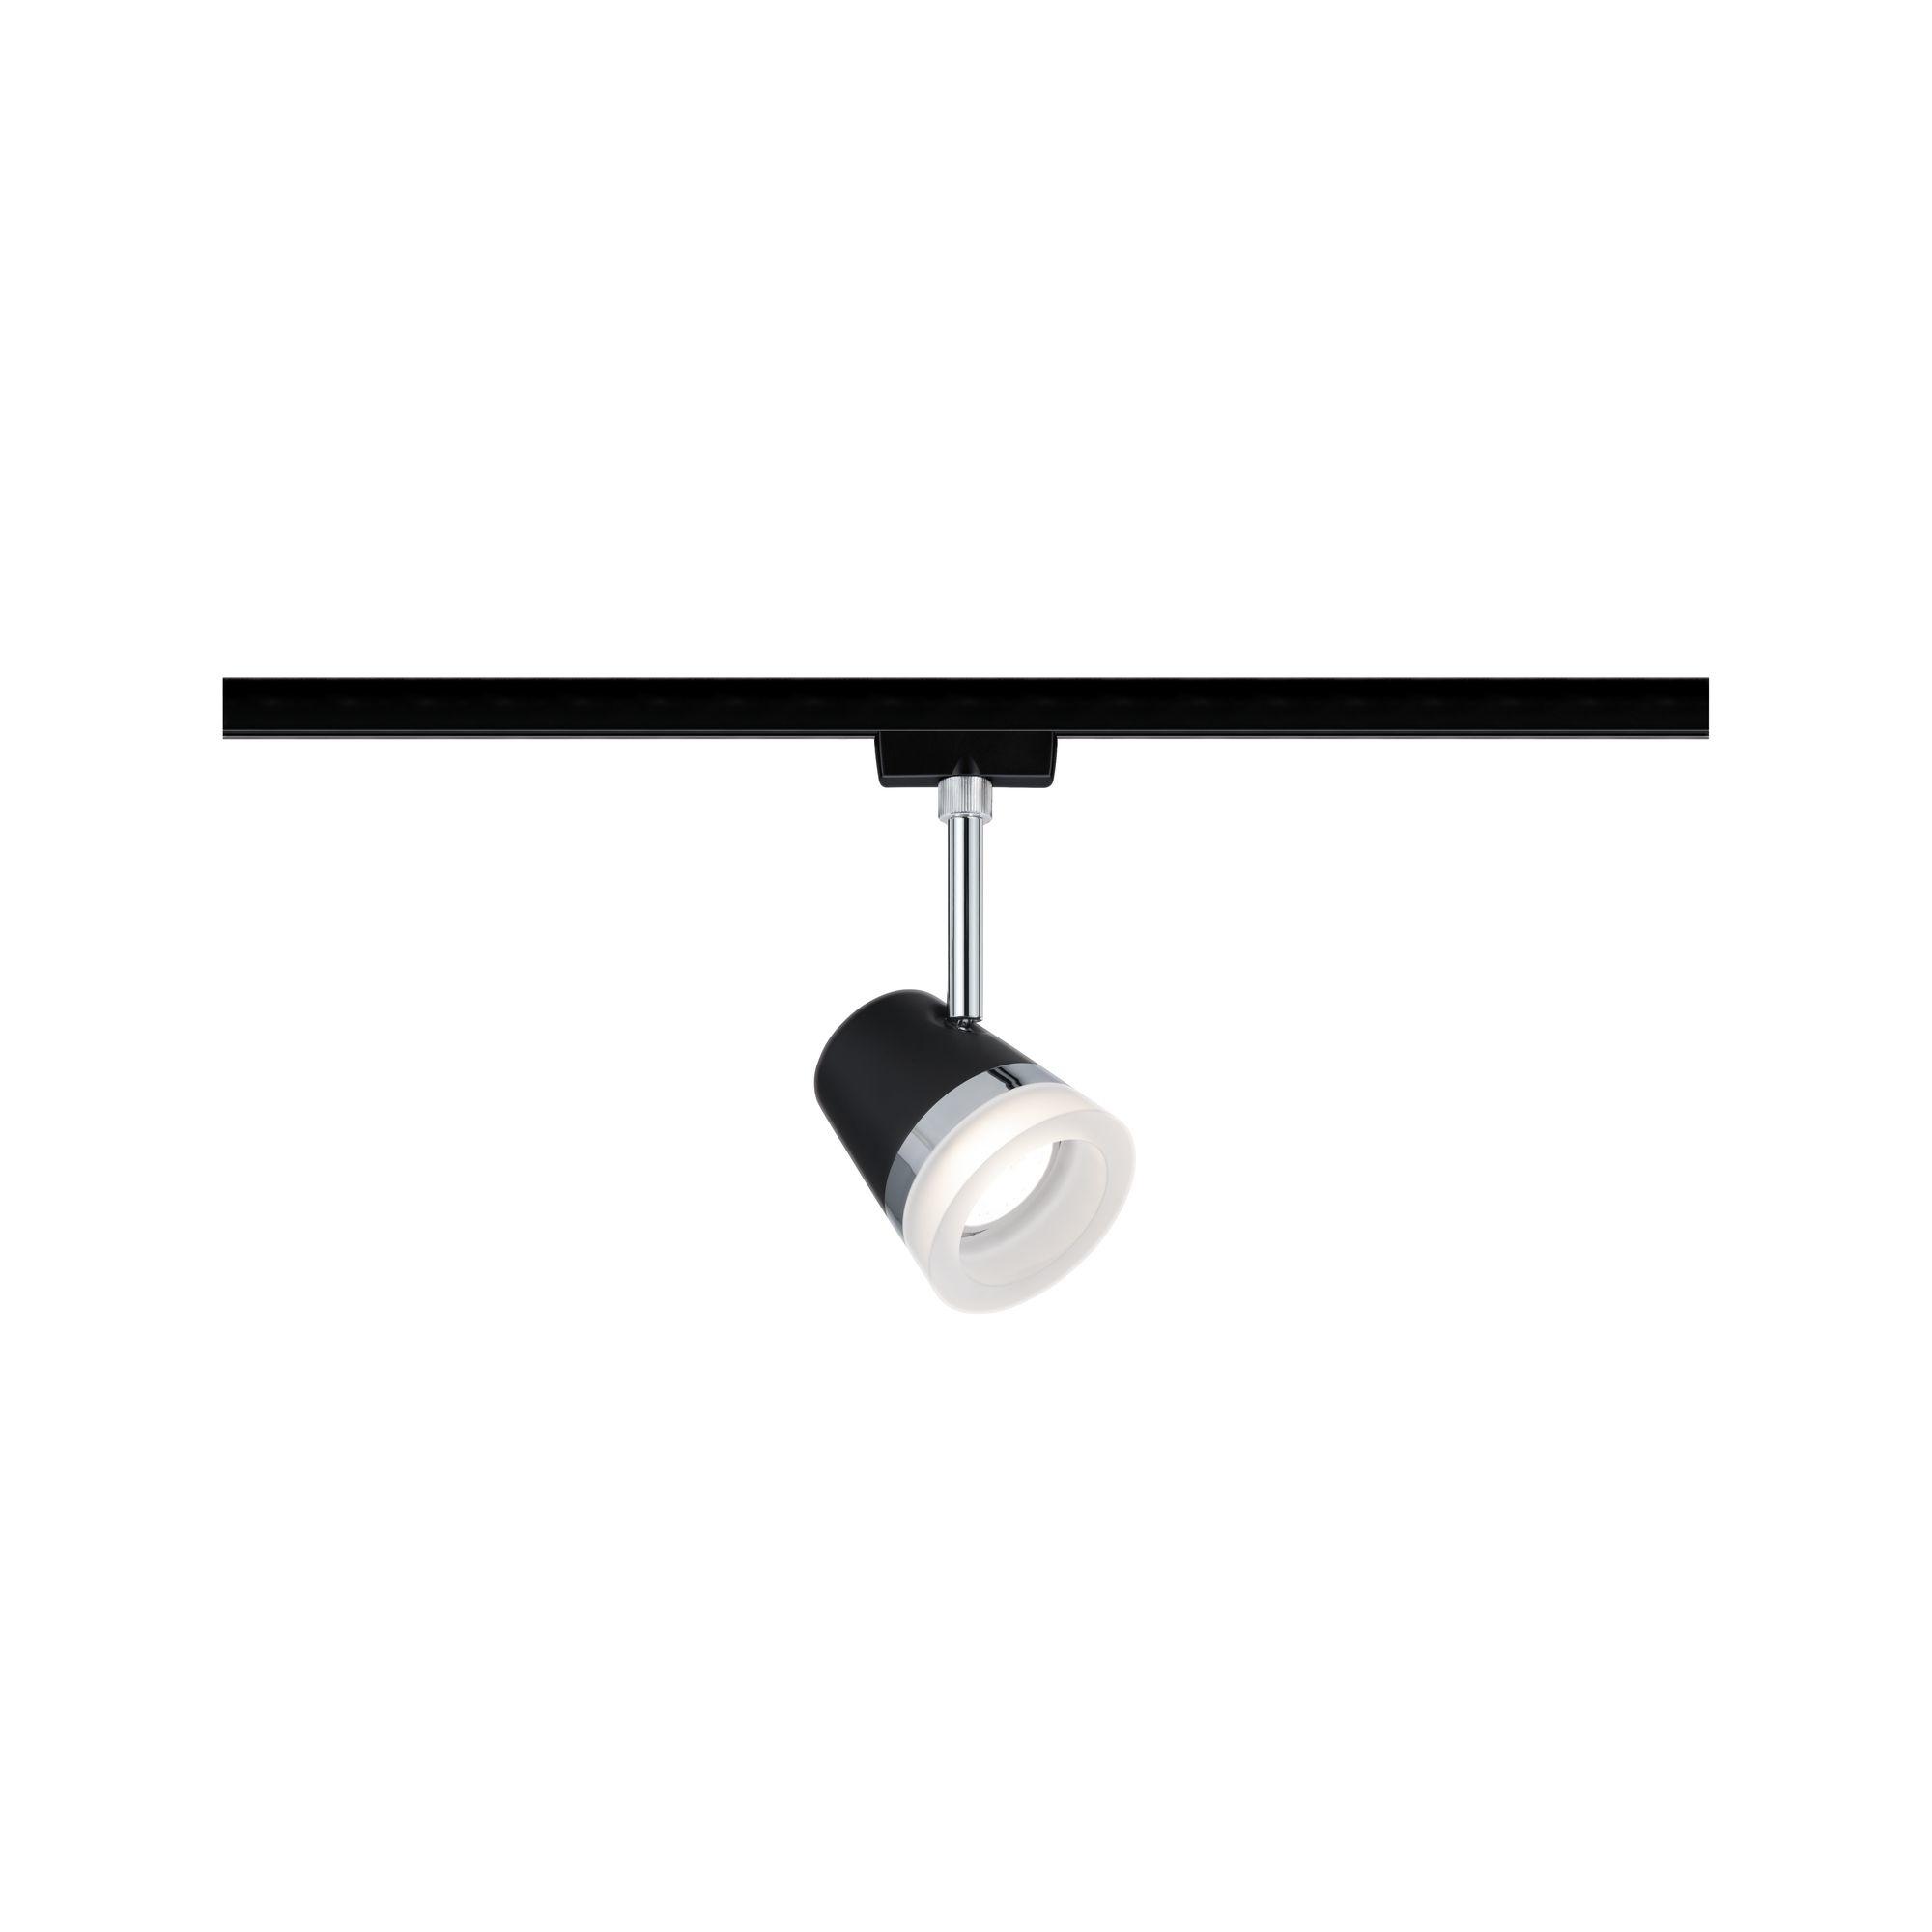 Paulmann URail Spot Cone max 1x15W Schwarz matt/ Chrom 230V Metall/Kunststoff